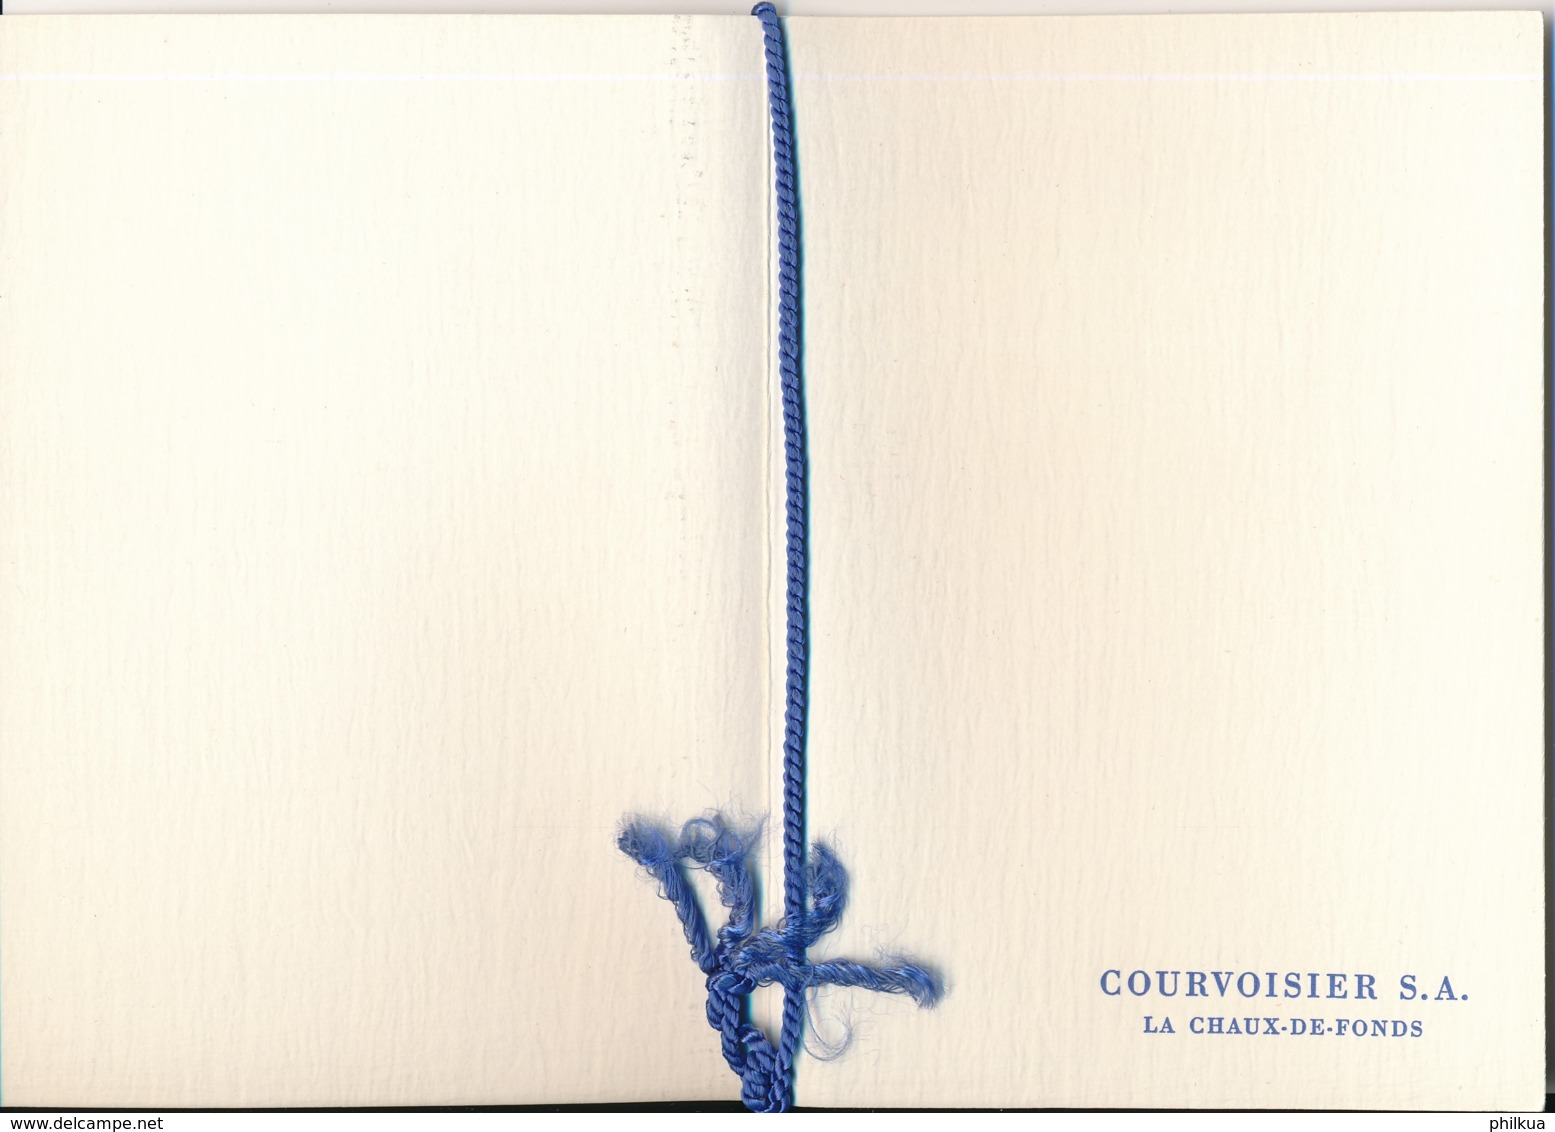 1958 Pro Juventute Vorlage Geschenkheft Von Courvoisier S.A. La Chaux De Fonds - Pro Juventute